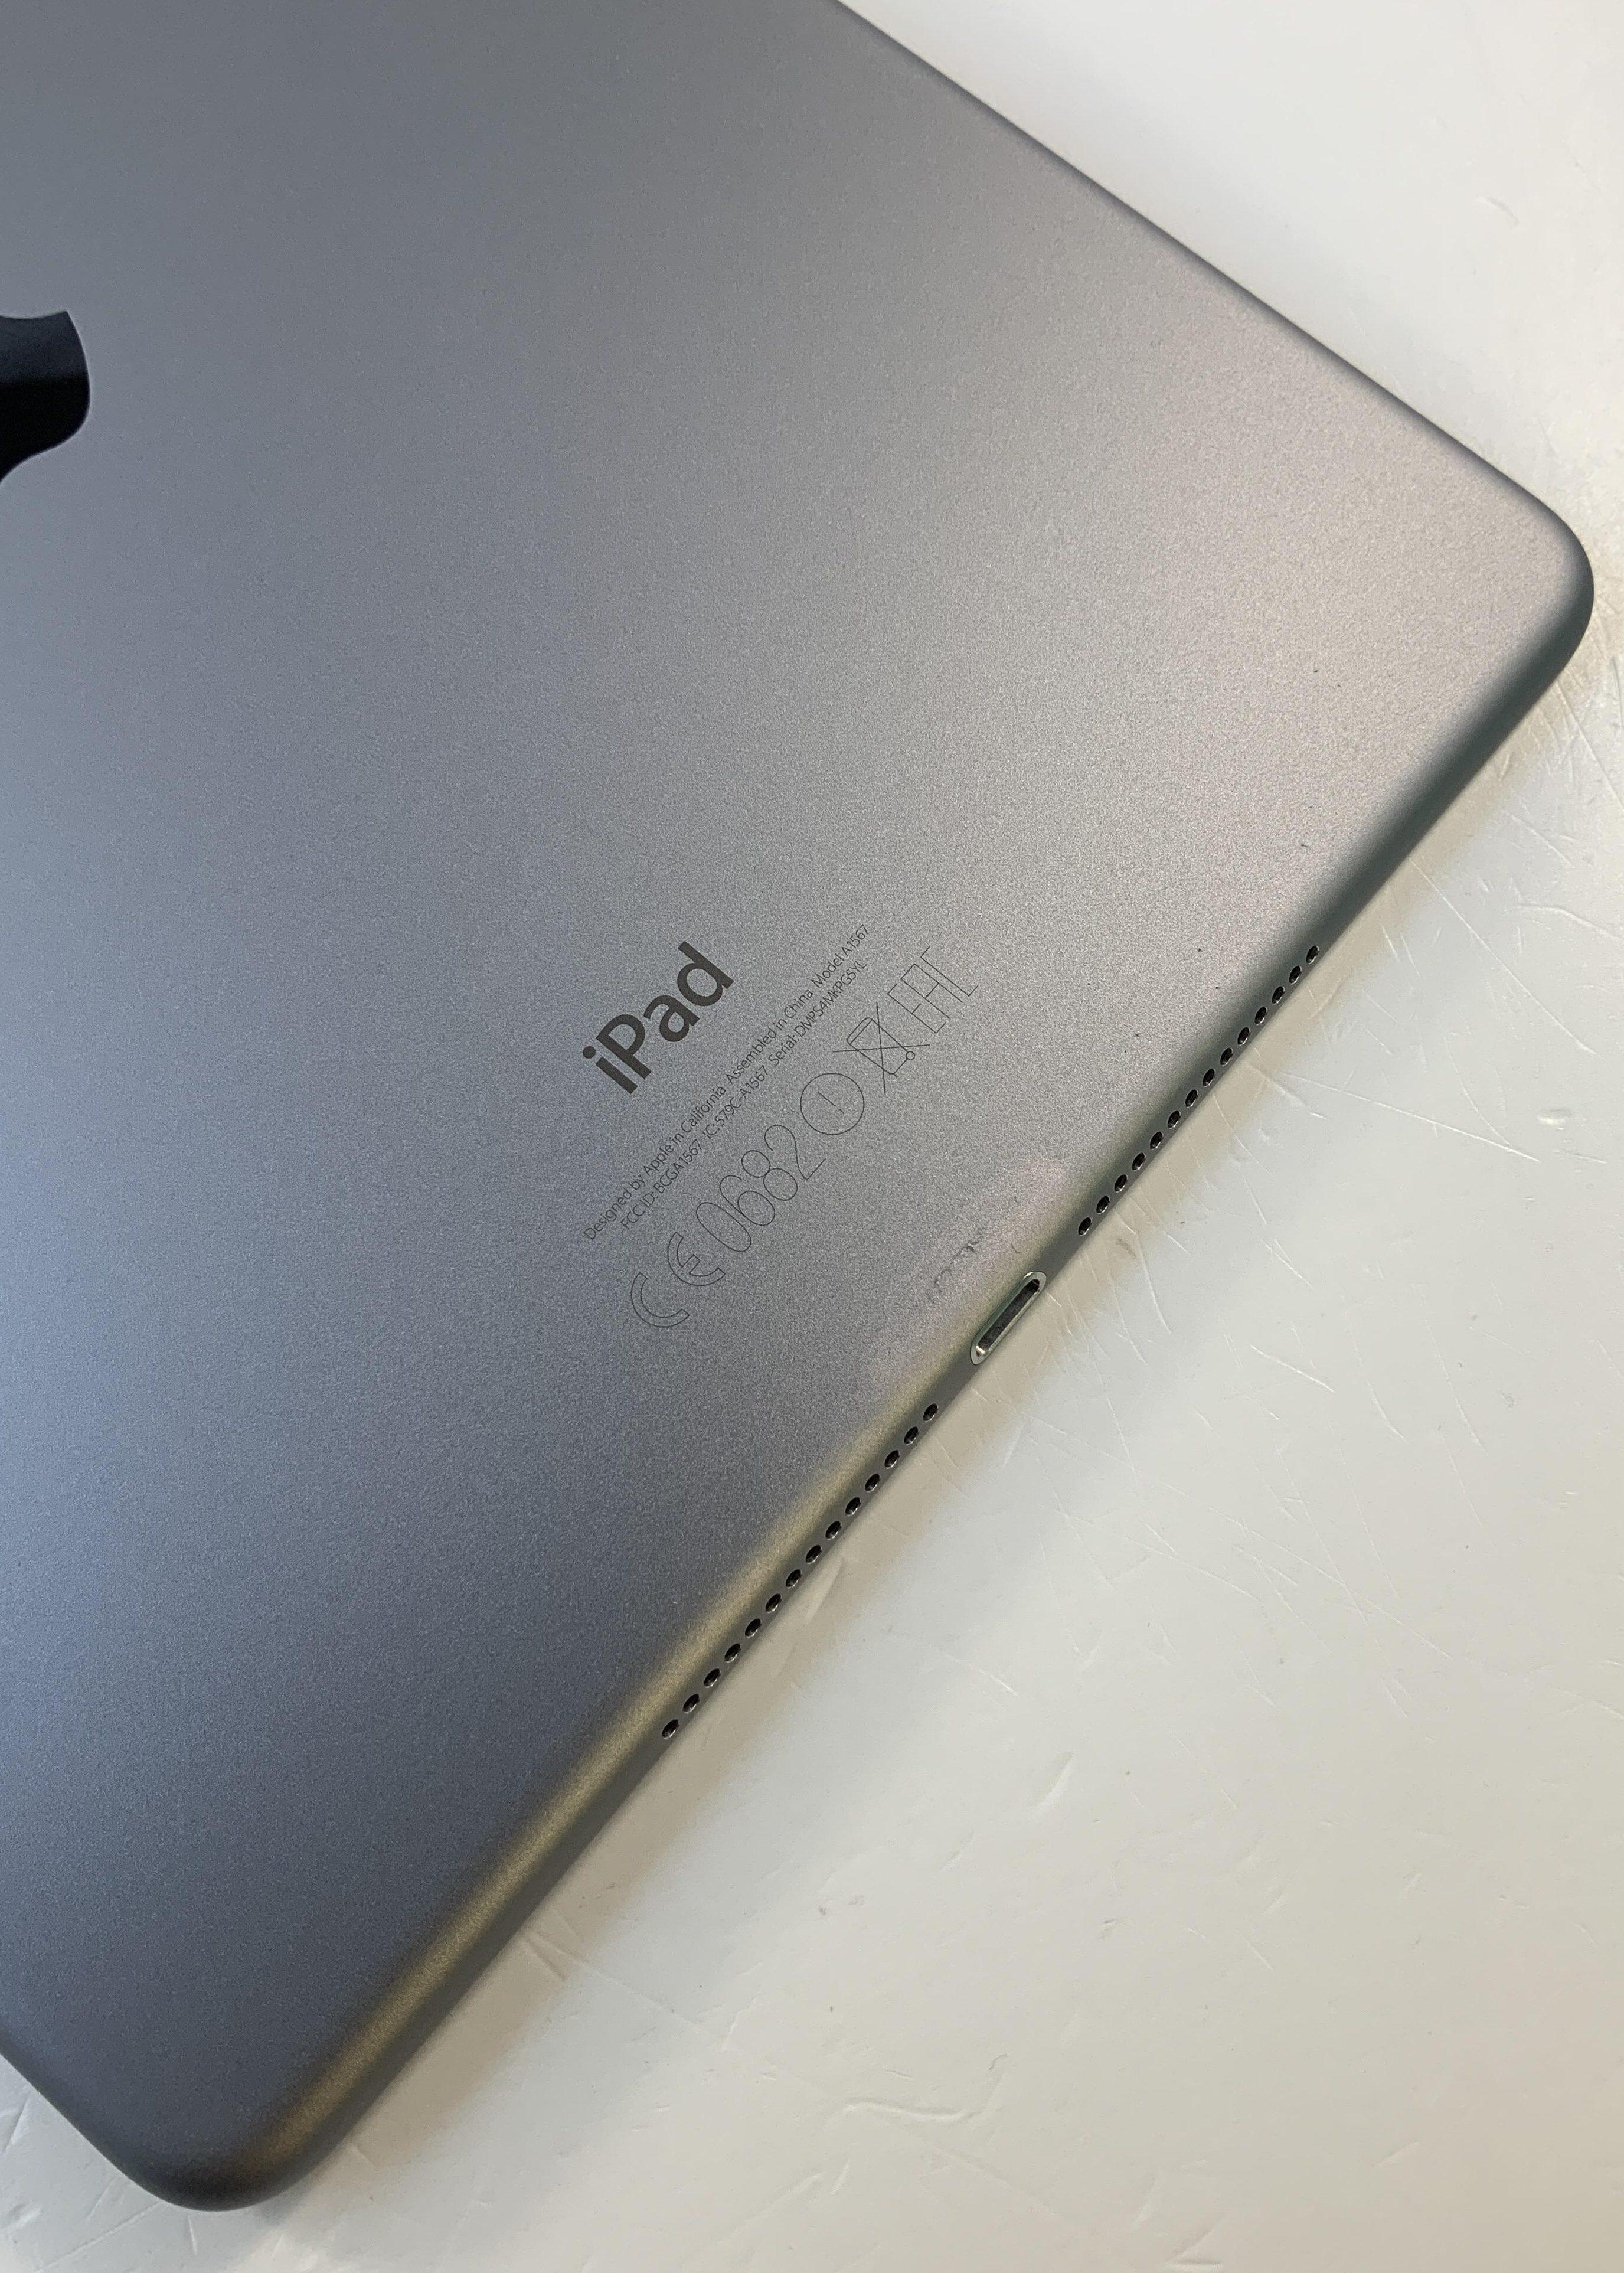 iPad Air 2 Wi-Fi + Cellular 64GB, 64GB, Space Gray, obraz 3